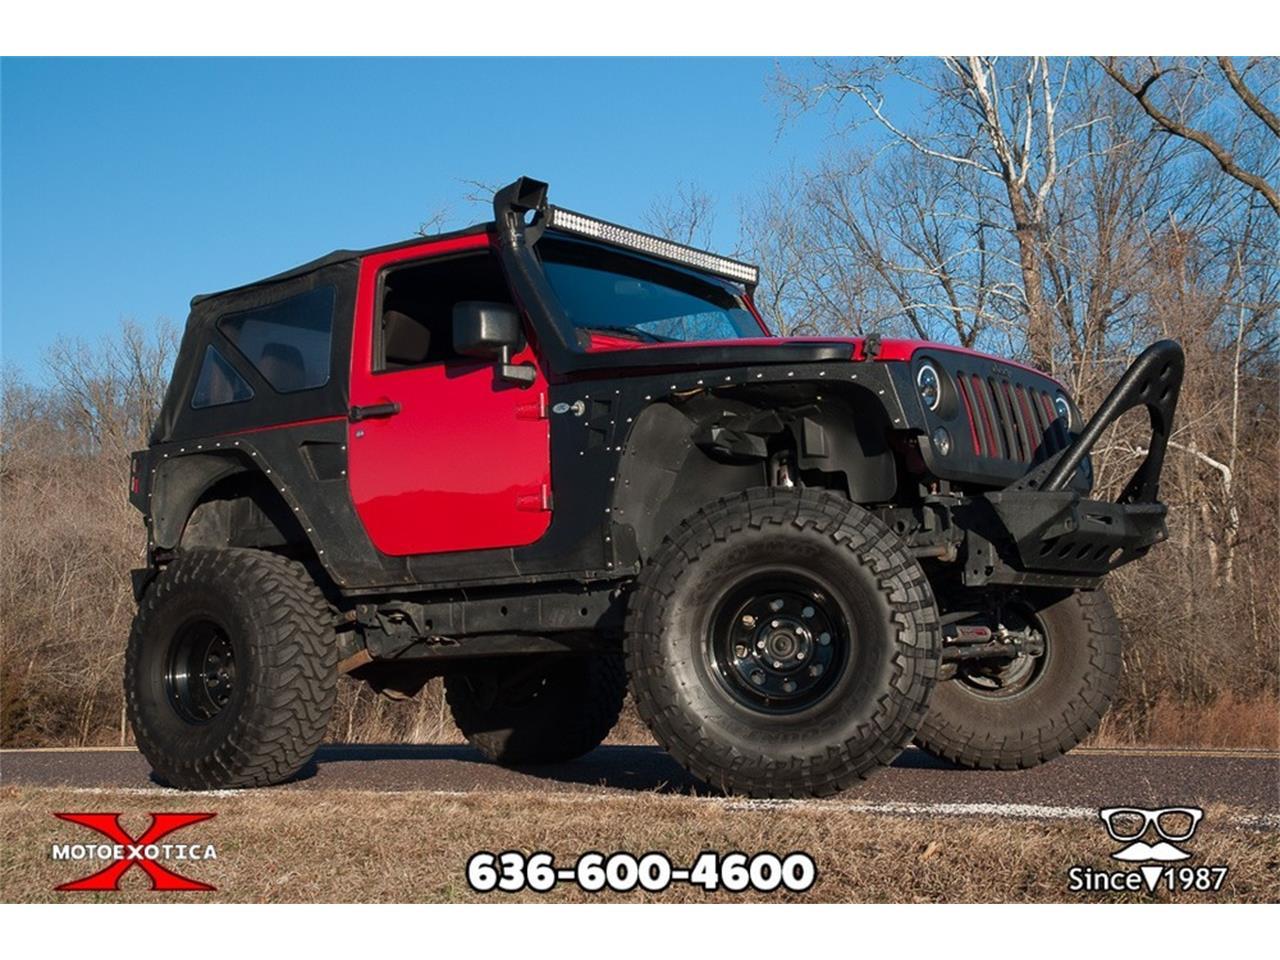 2014 Jeep Wrangler (CC-1219679) for sale in St. Louis, Missouri